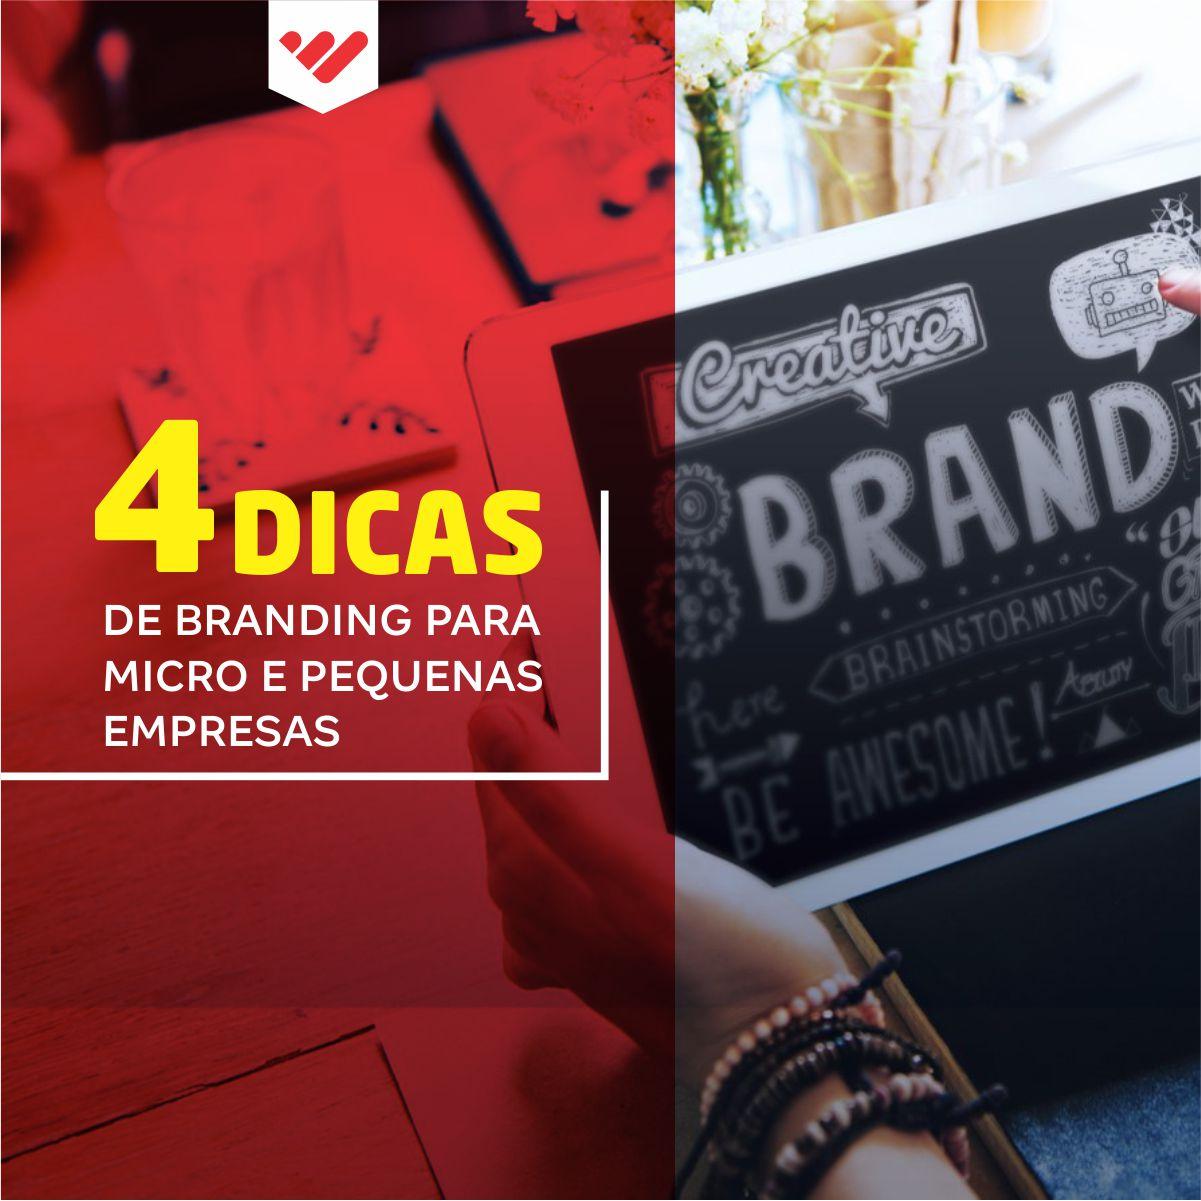 4 dicas de branding para micro e pequenas empresas